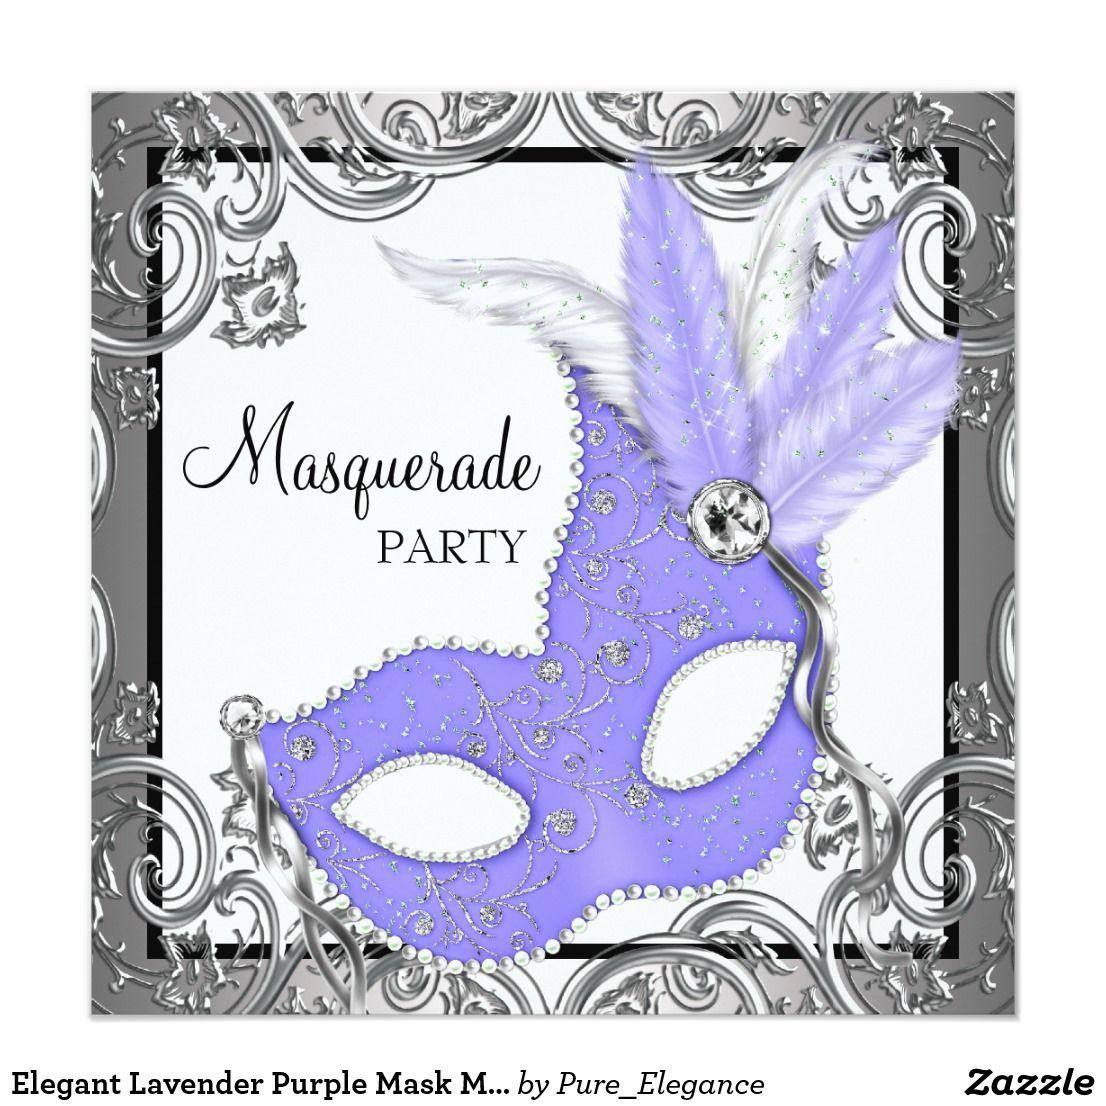 Elegant Lavender Purple Mask Masquerade Party Card | Masquerade ...